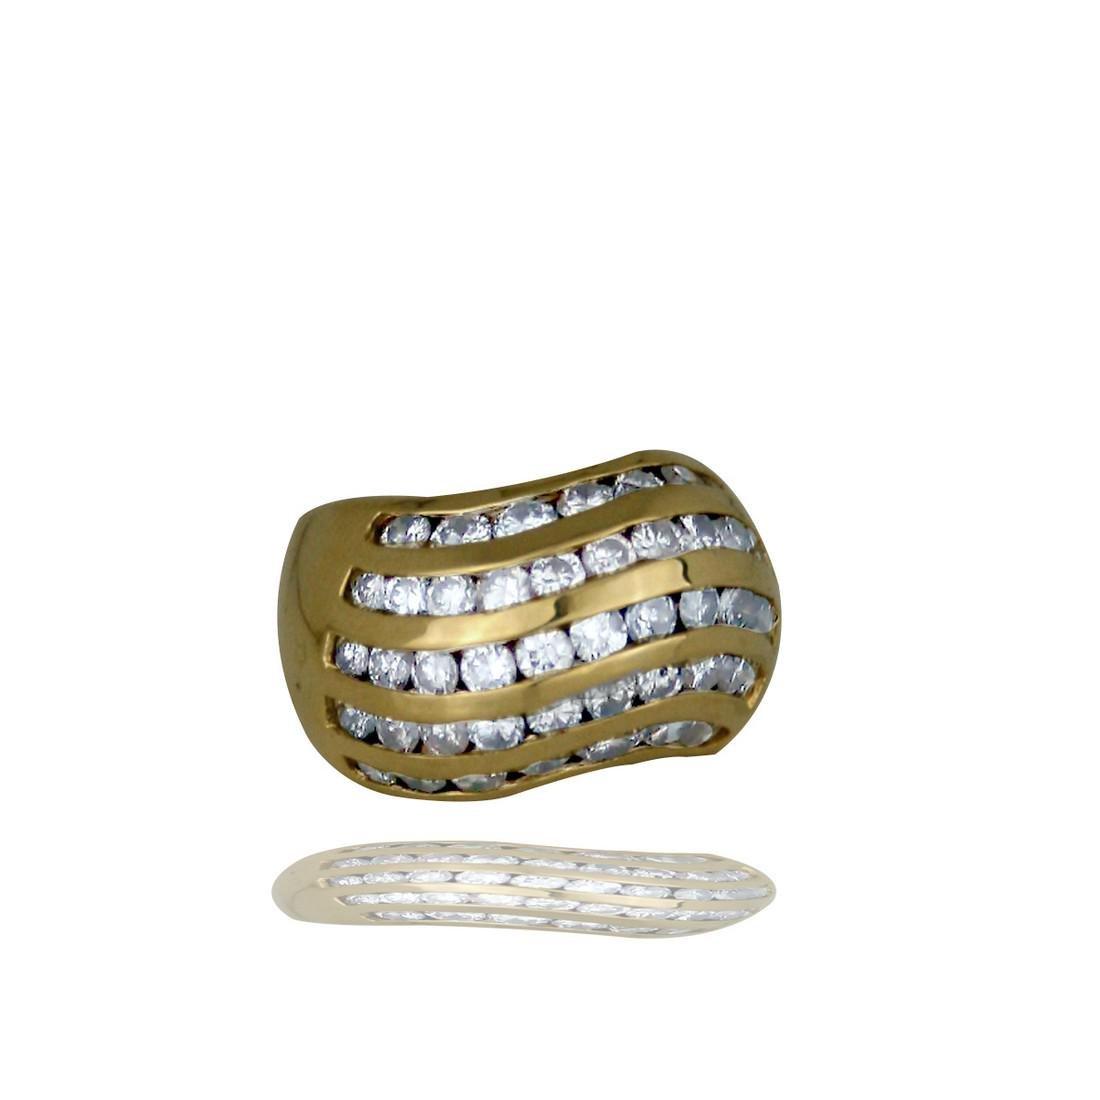 14 Kt. 2.25 TCW 5-Row, Channel Set Diamond Ring